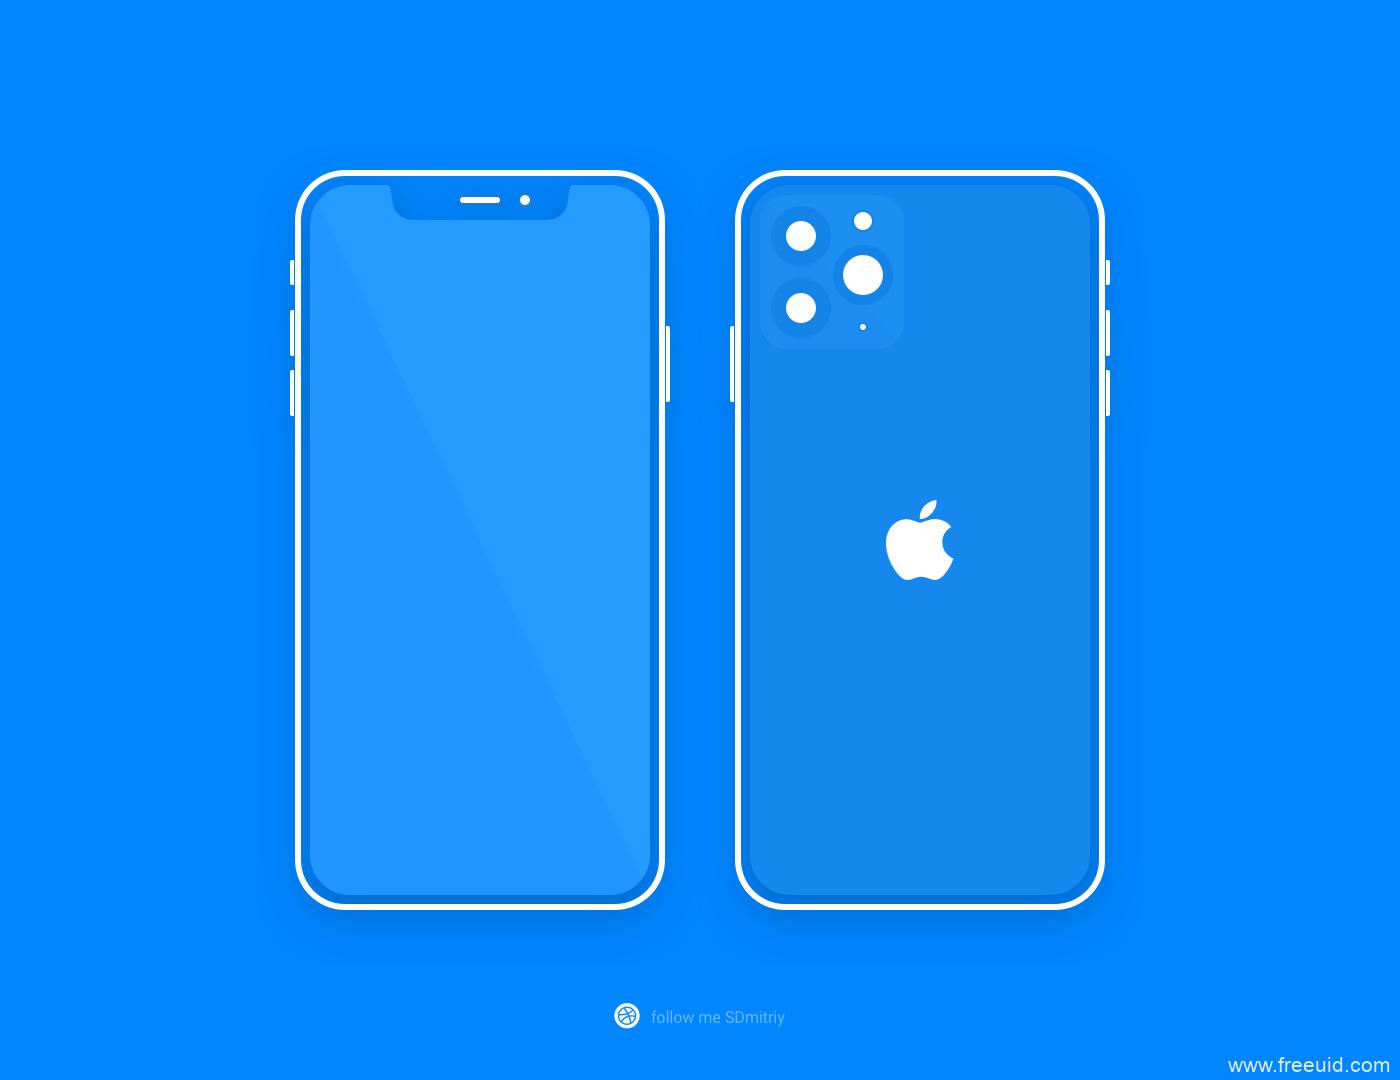 iphone 11 pro 线框图mockup .sketch素材下载